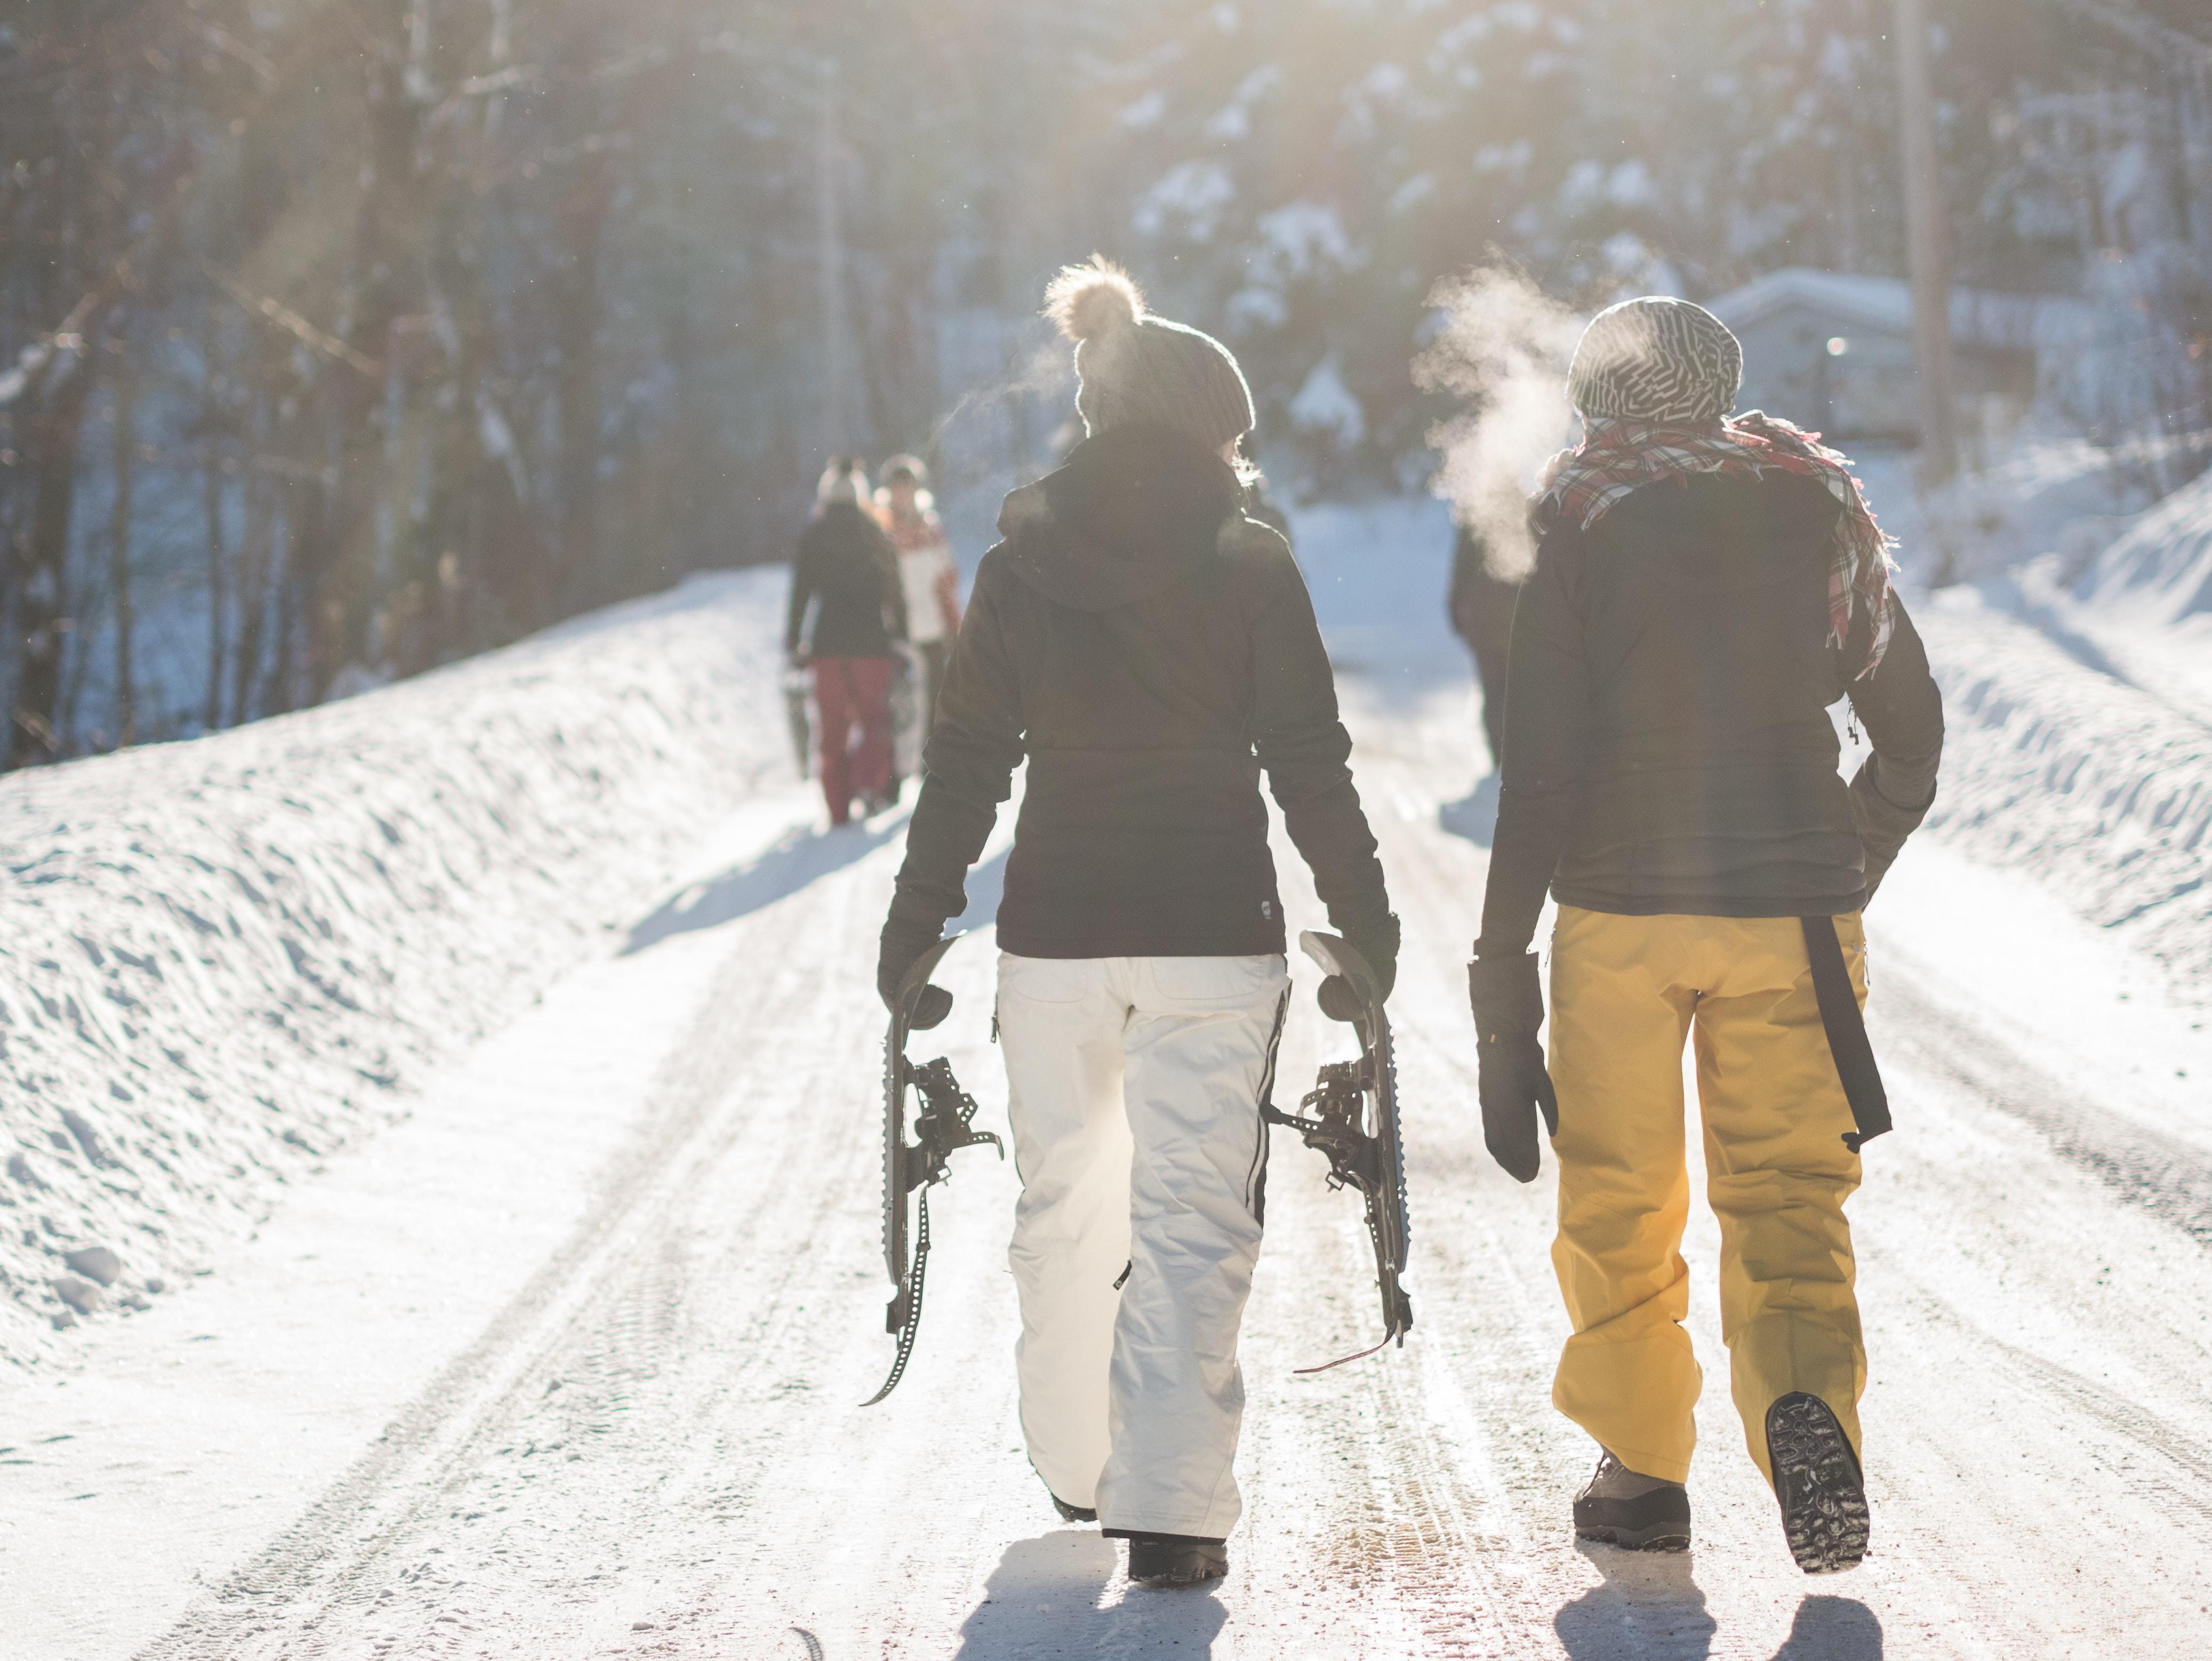 Best Gloves for Ski Touring [2021 UPDATED]